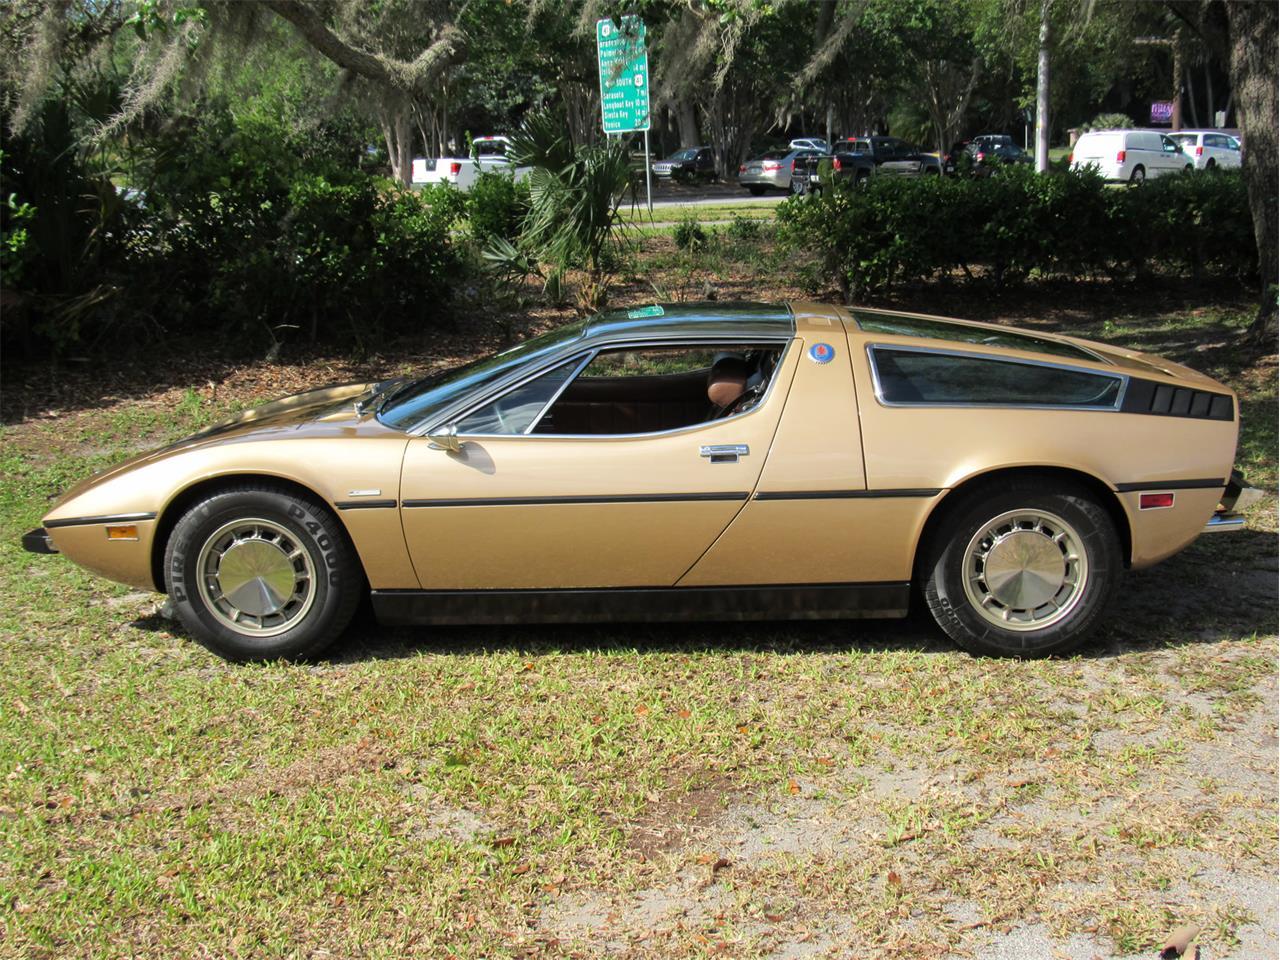 1974 Maserati Bora for Sale   ClassicCars.com   CC-888041